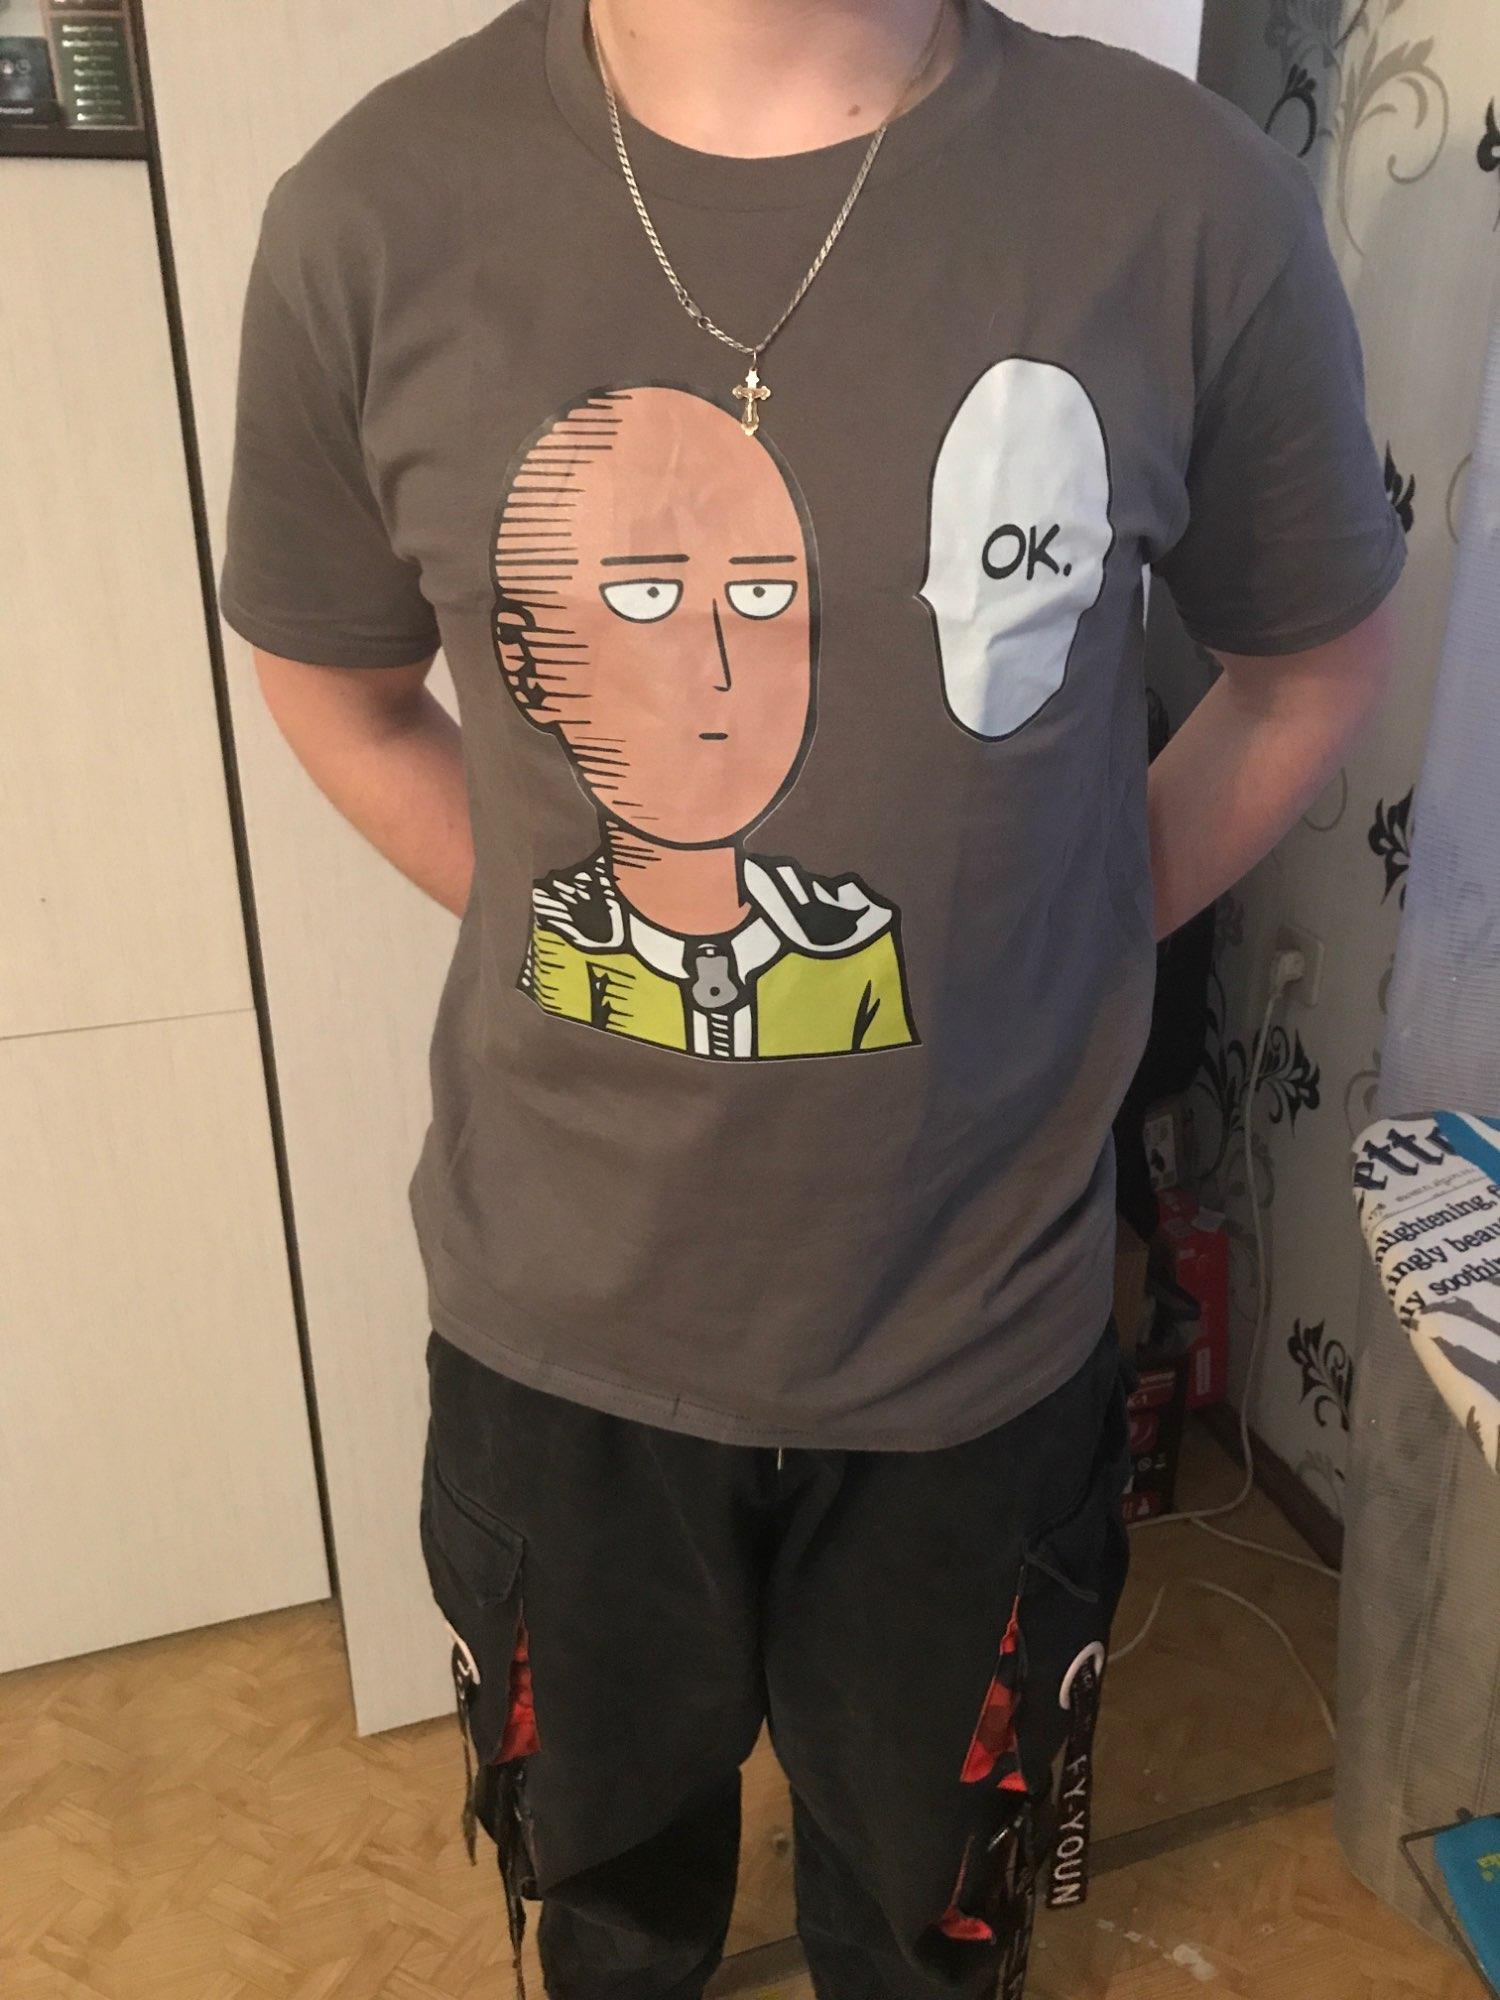 One Punch Man Japanese Anime T Shirt Harajuku Fashion Mens Plain T Shirts Premium Cotton Camisas Hombre Men Tshirt photo review